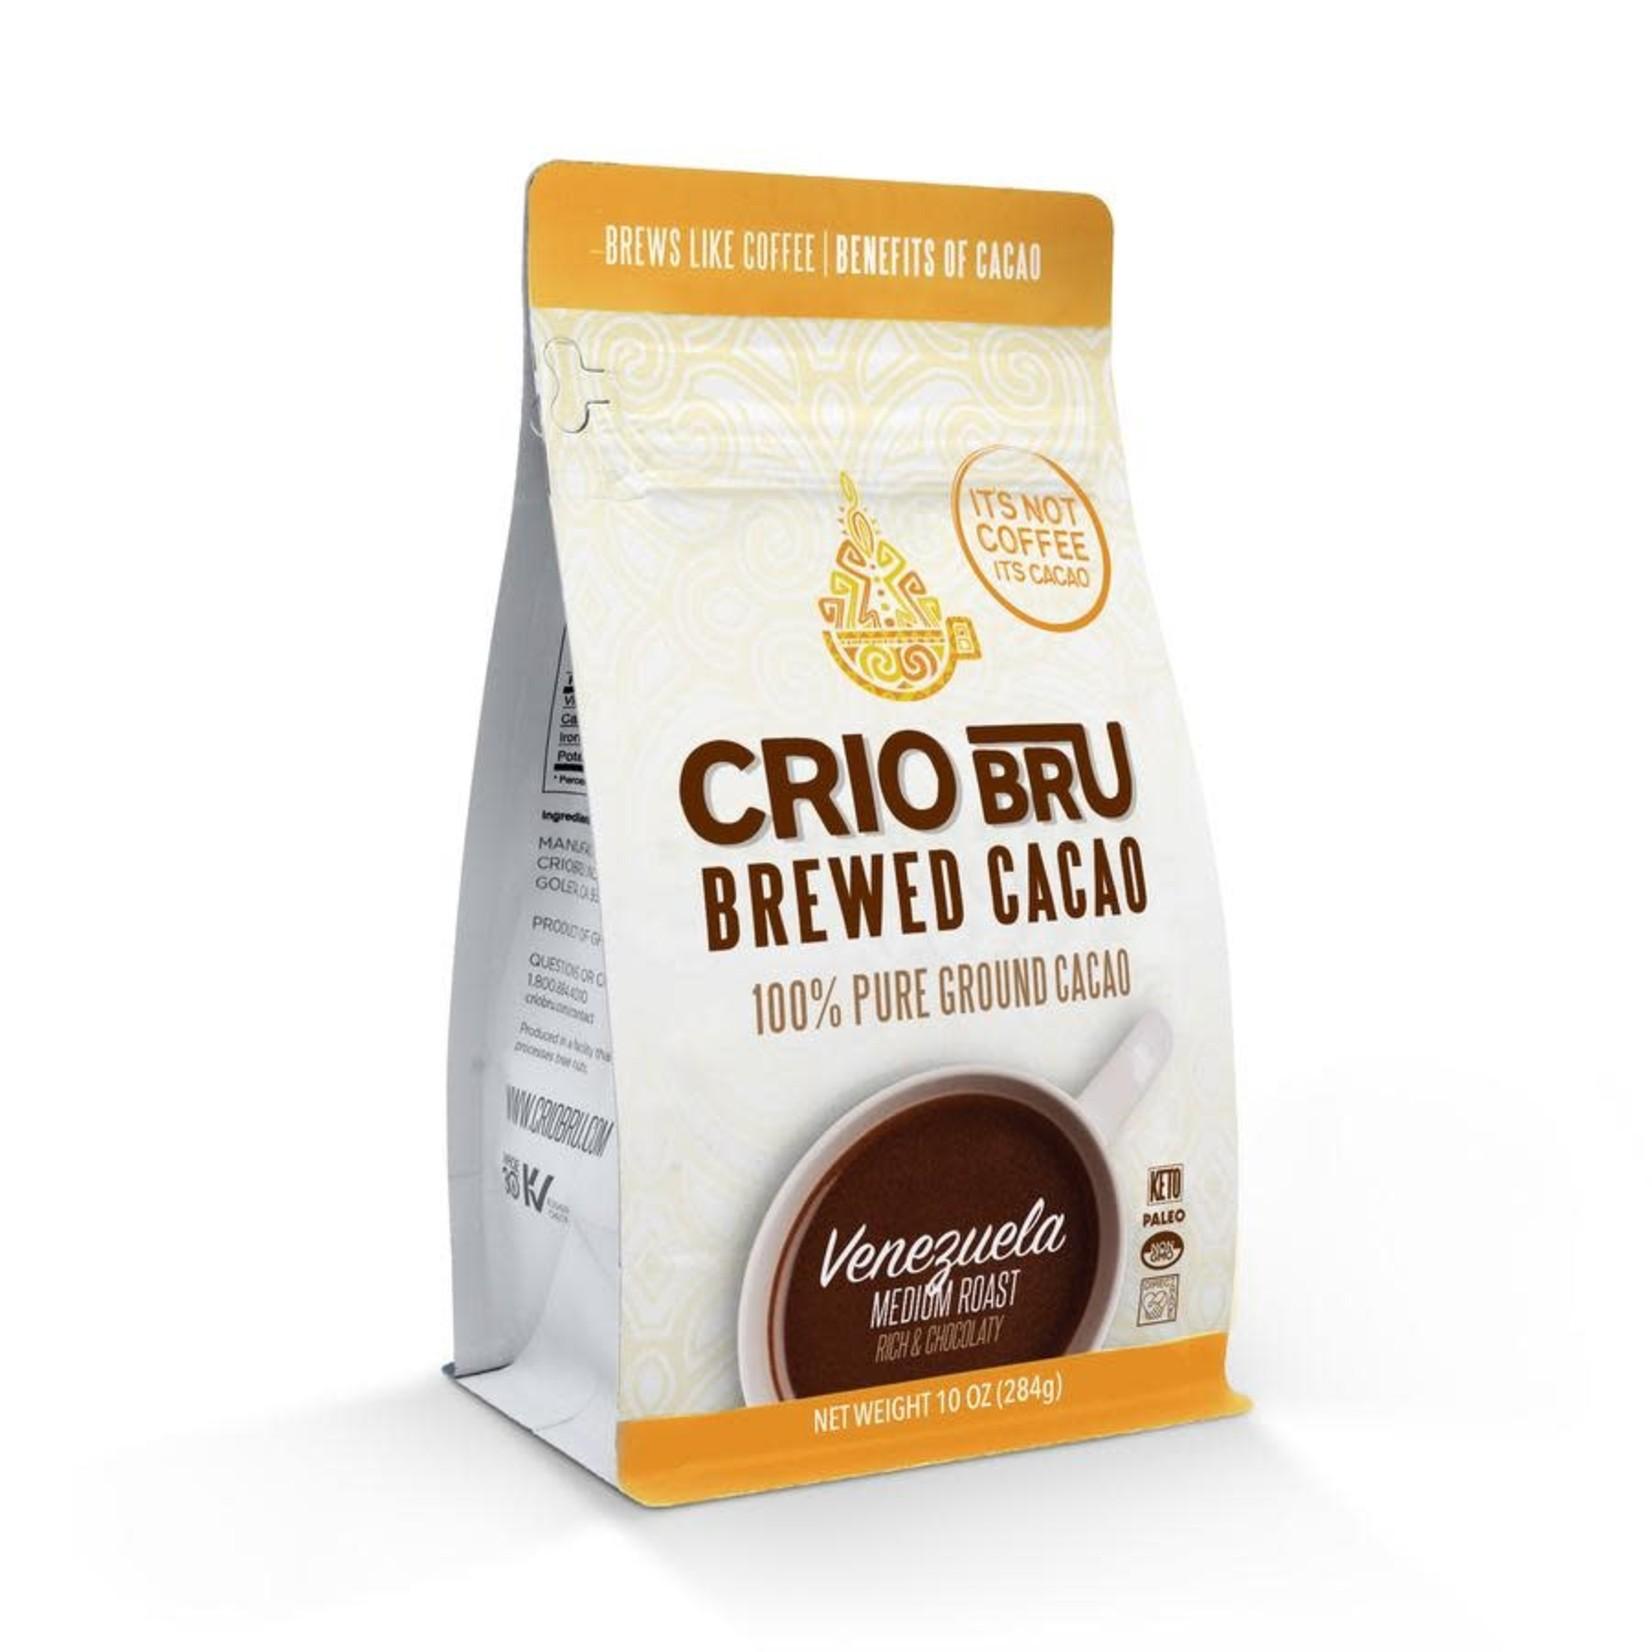 Crio Bru Venezuela Medium Roast